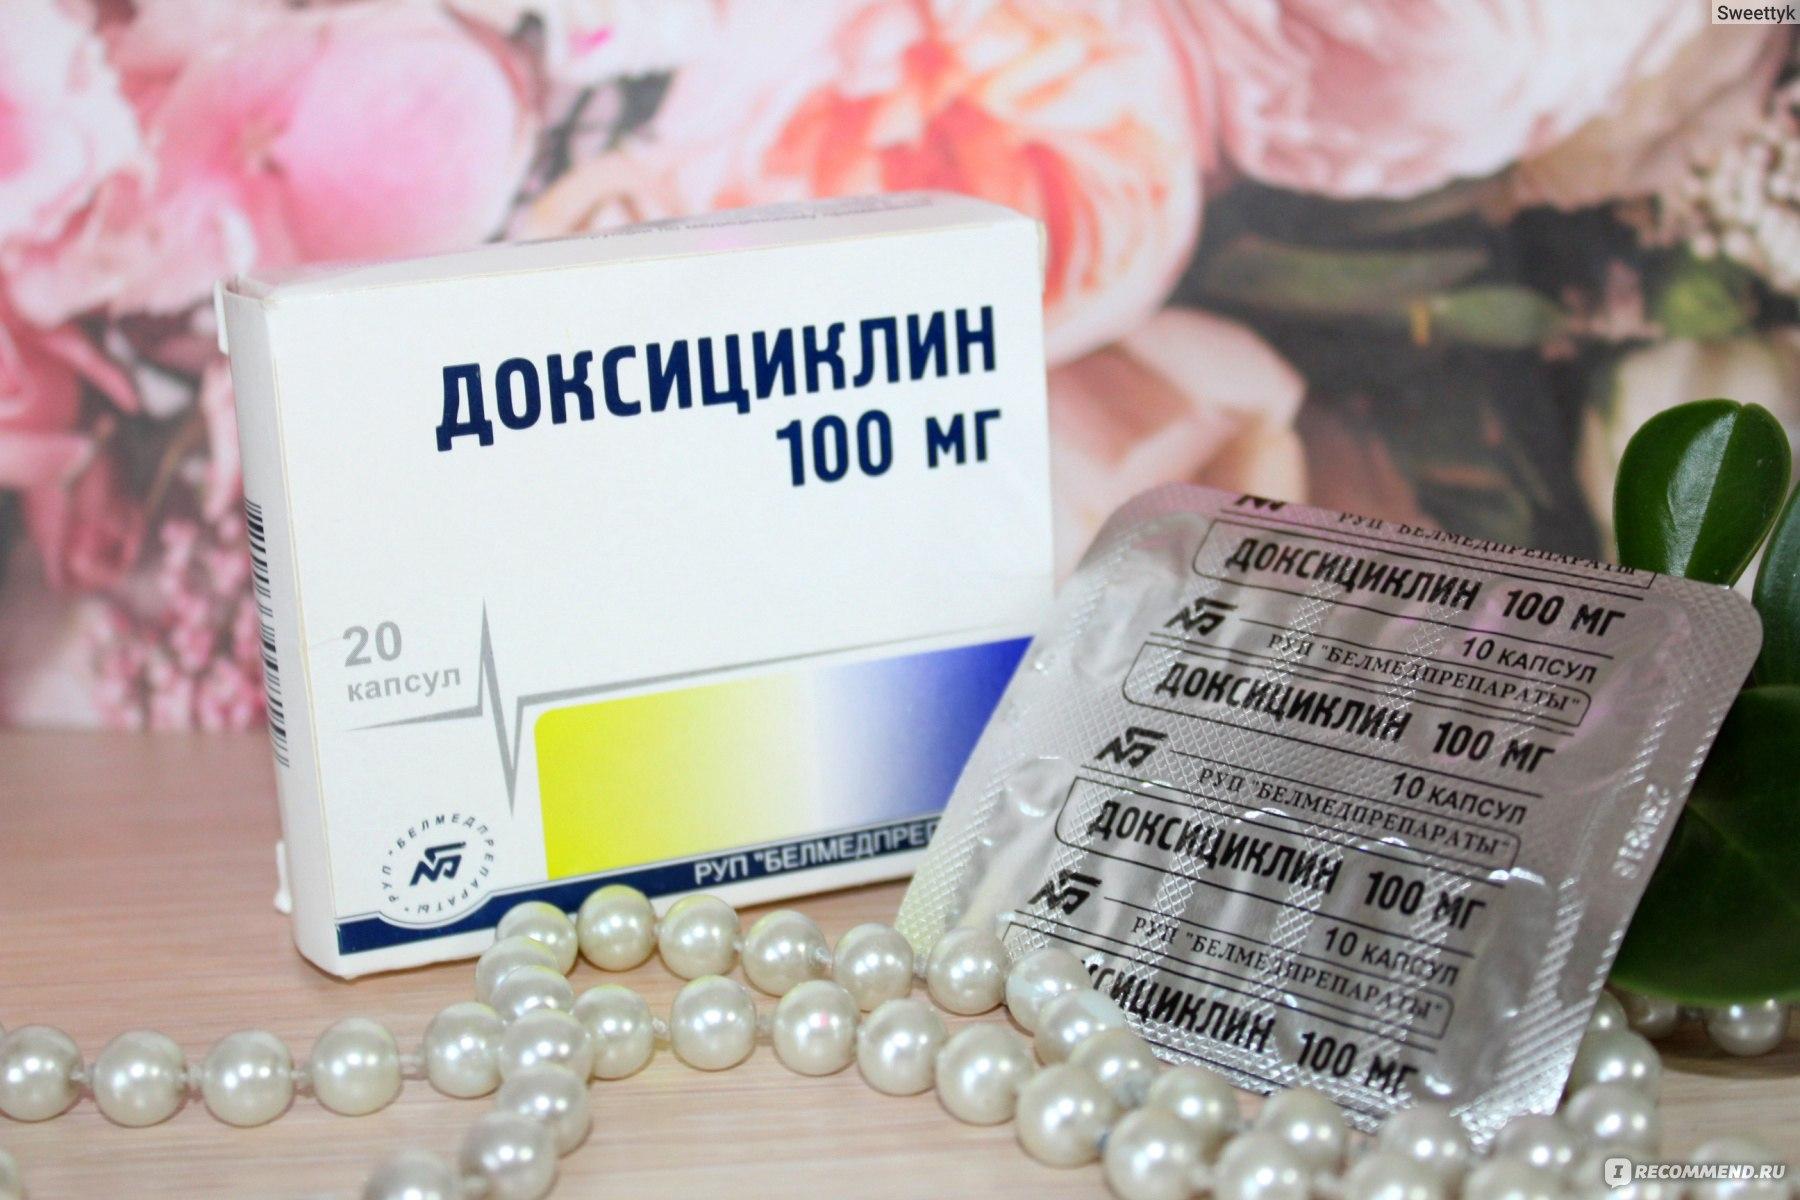 антибиотики от простатита доксициклином